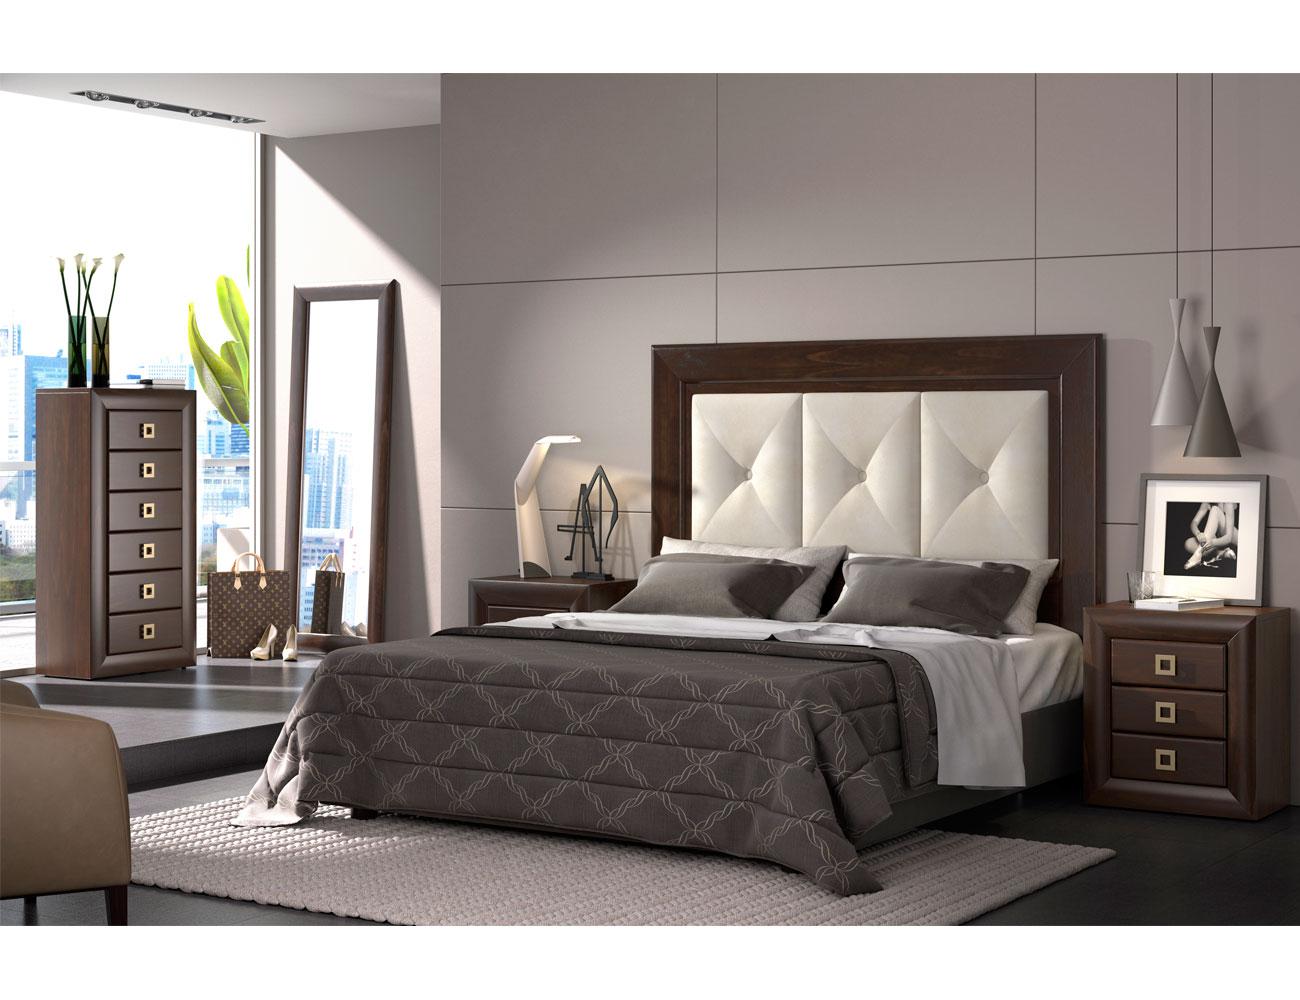 Dormitorio matrimonio nogal tapizado1